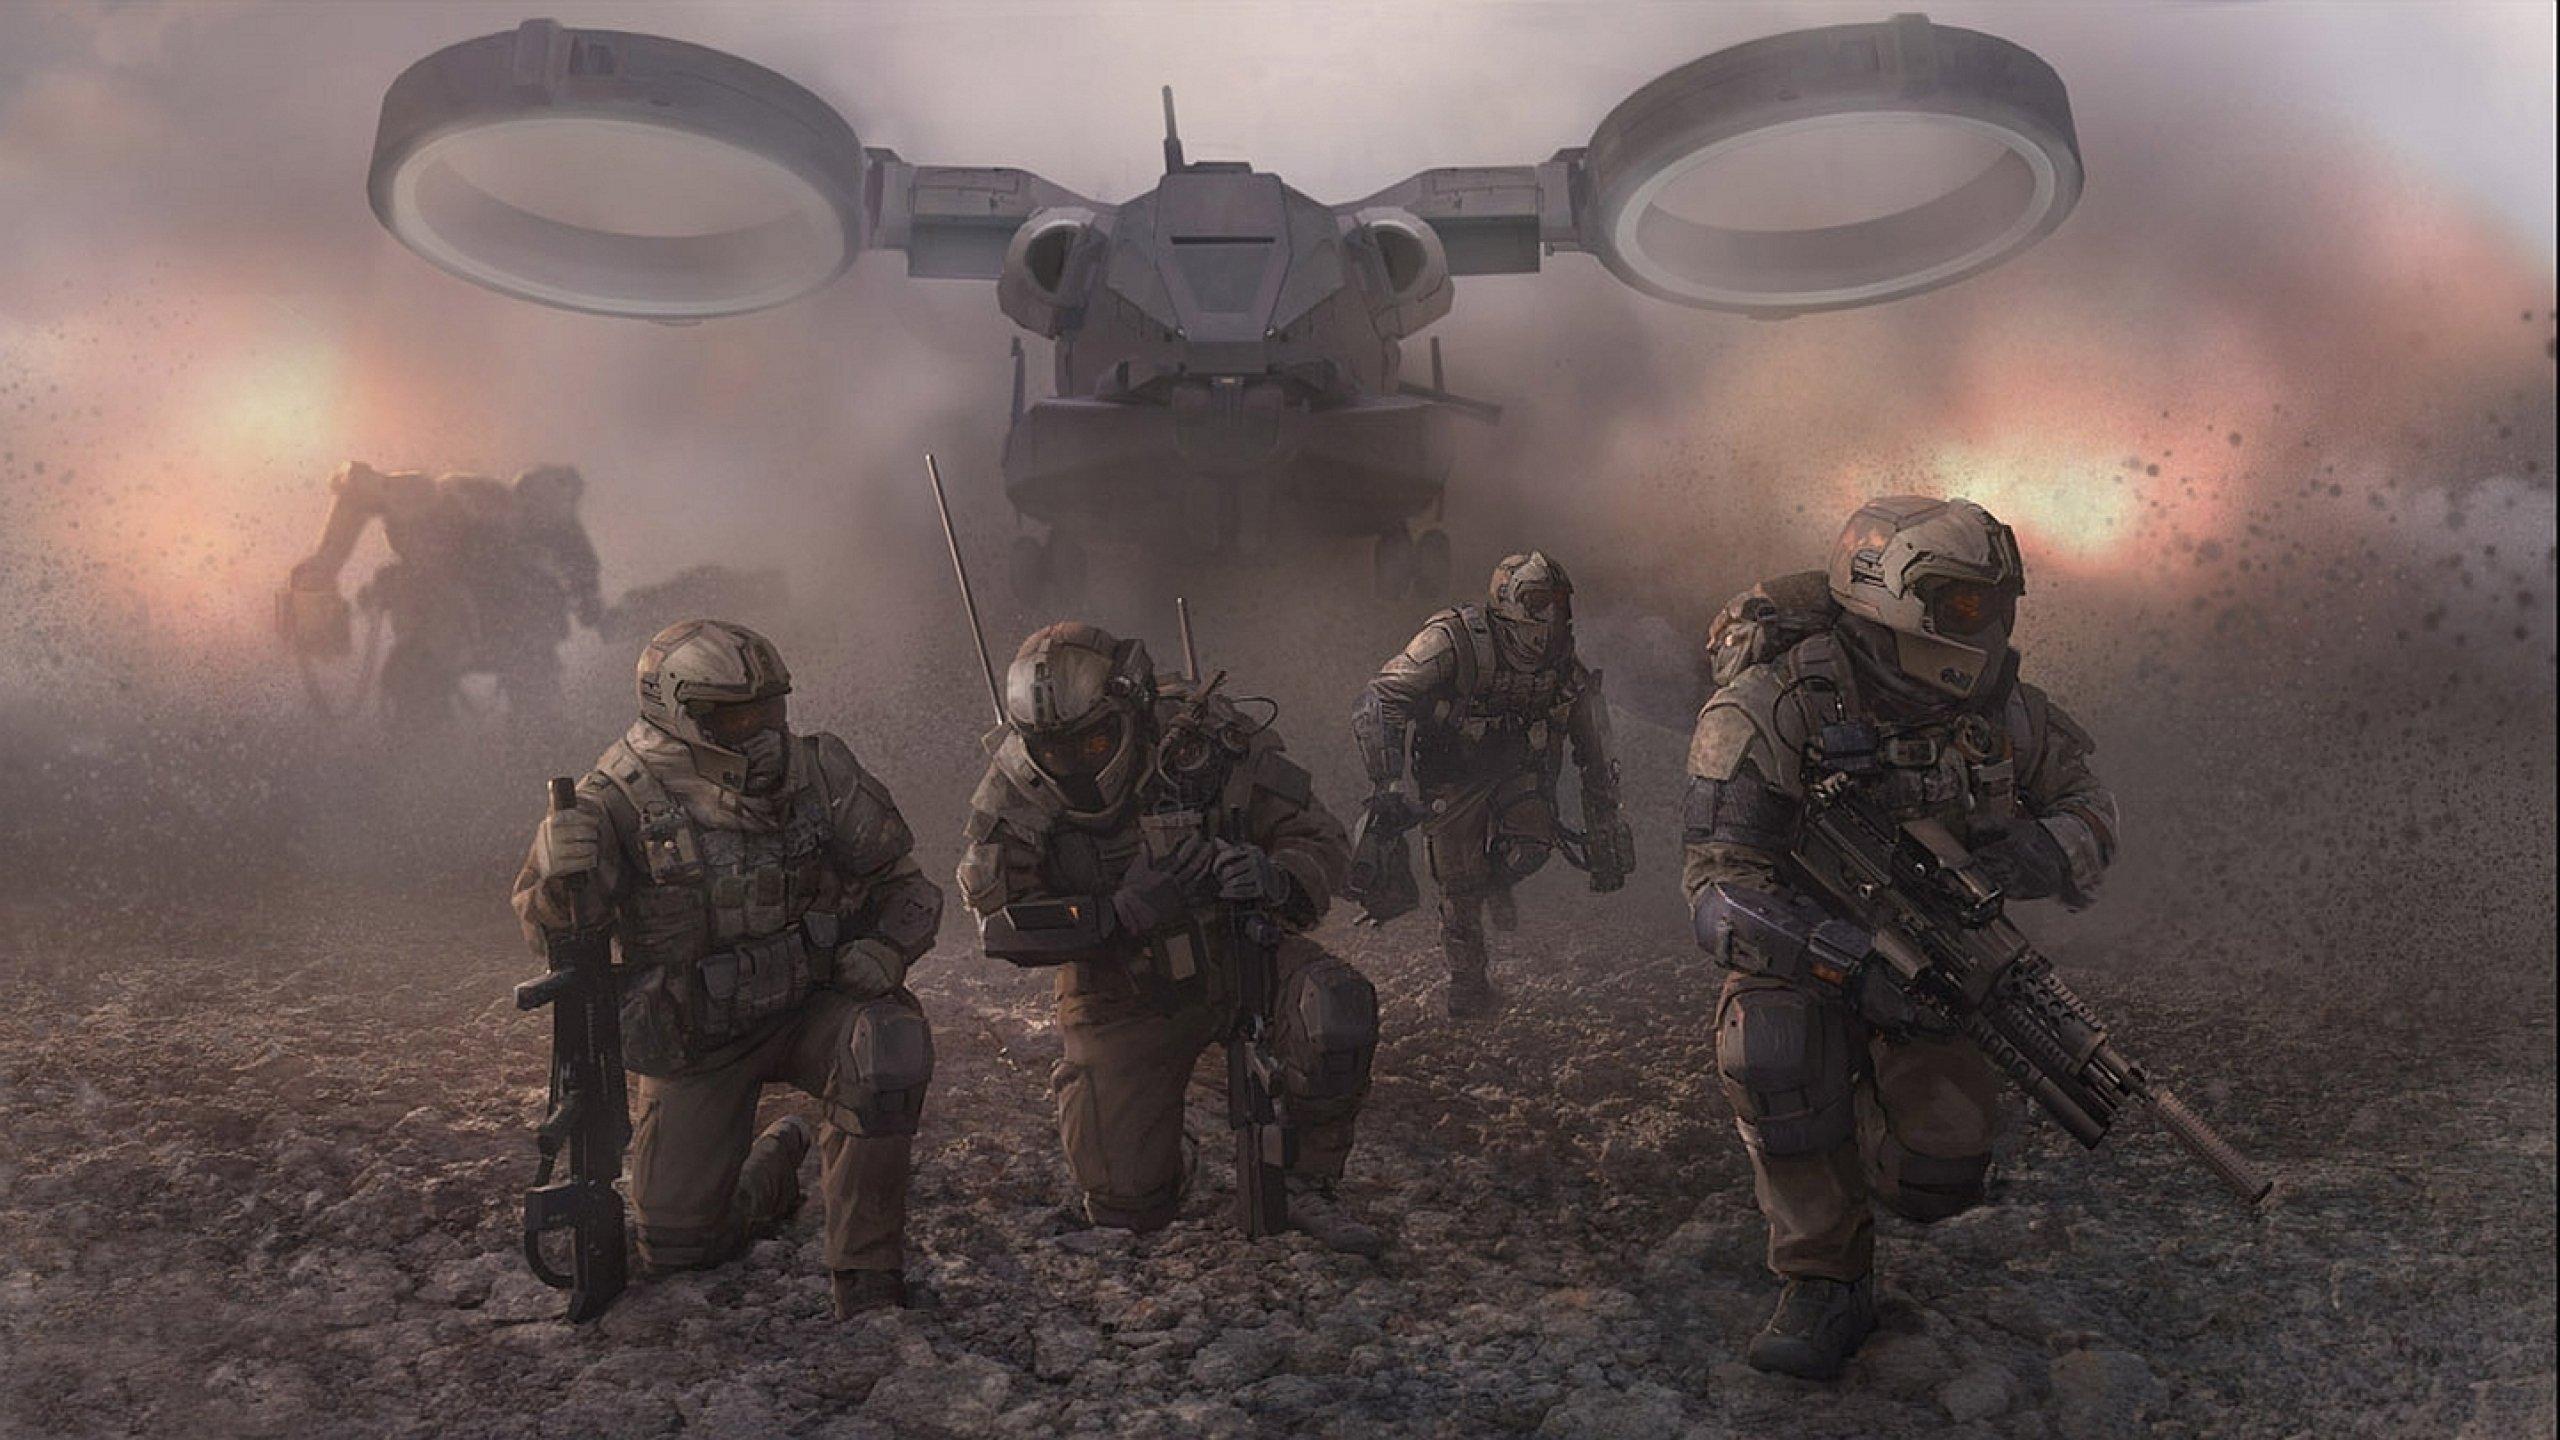 Sci Fi Wallpaper 2560x1440: Sci-fi Warrior Futuristic Art Artwork Wallpaper